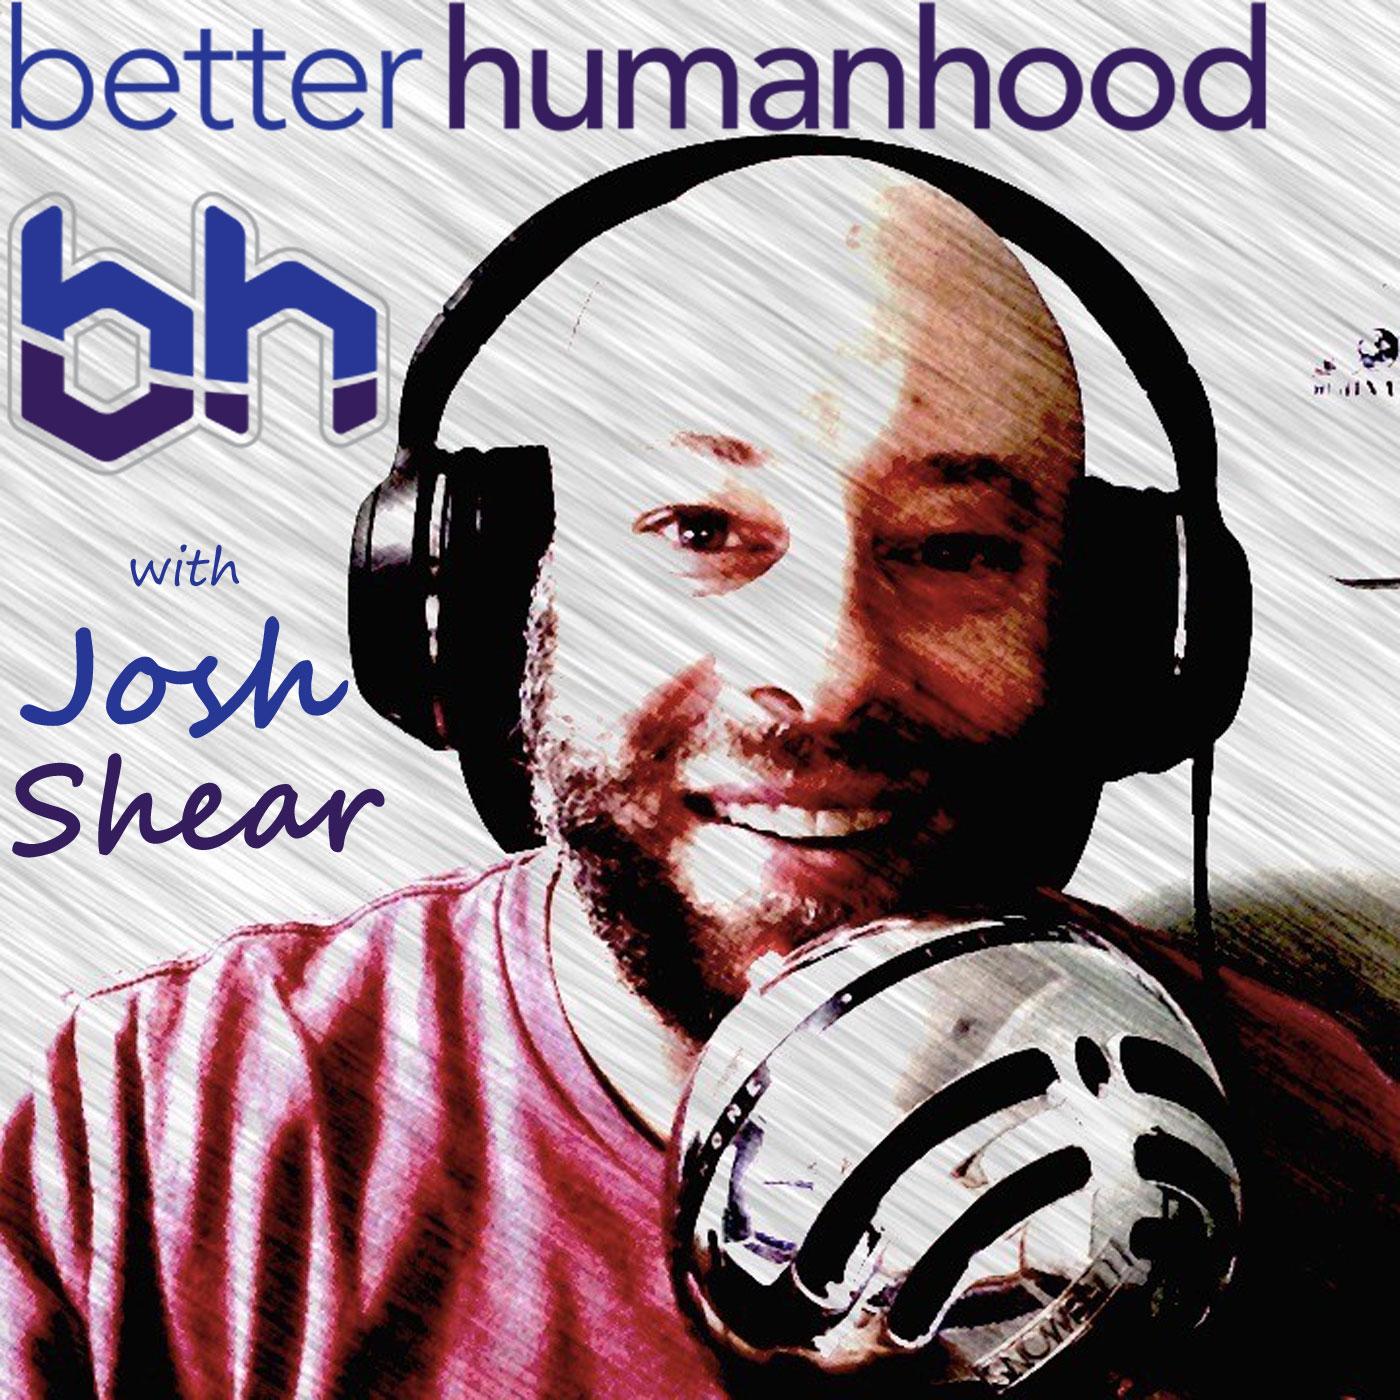 Better Humanhood